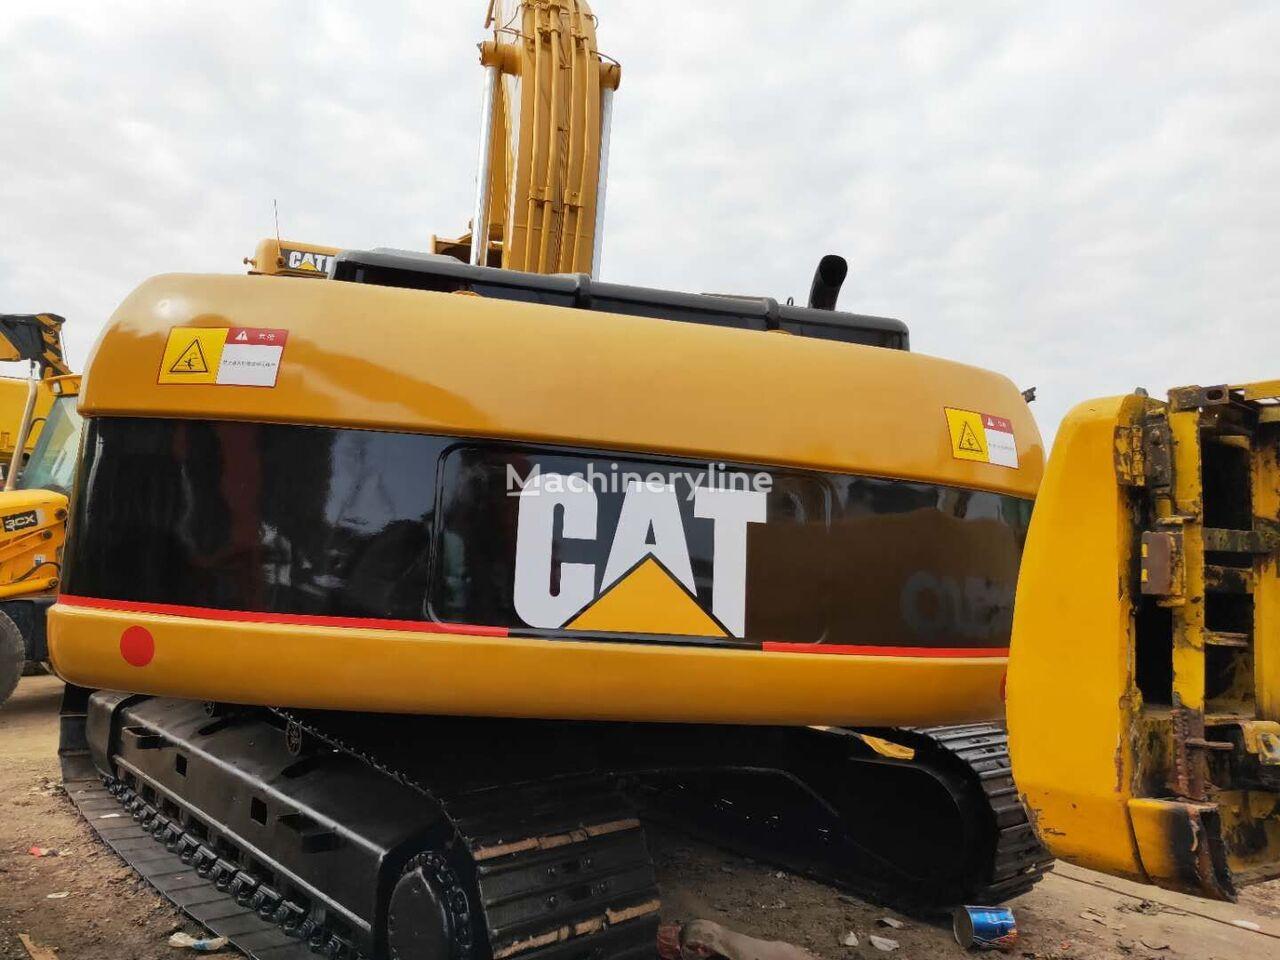 CATERPILLAR 330C walking excavator